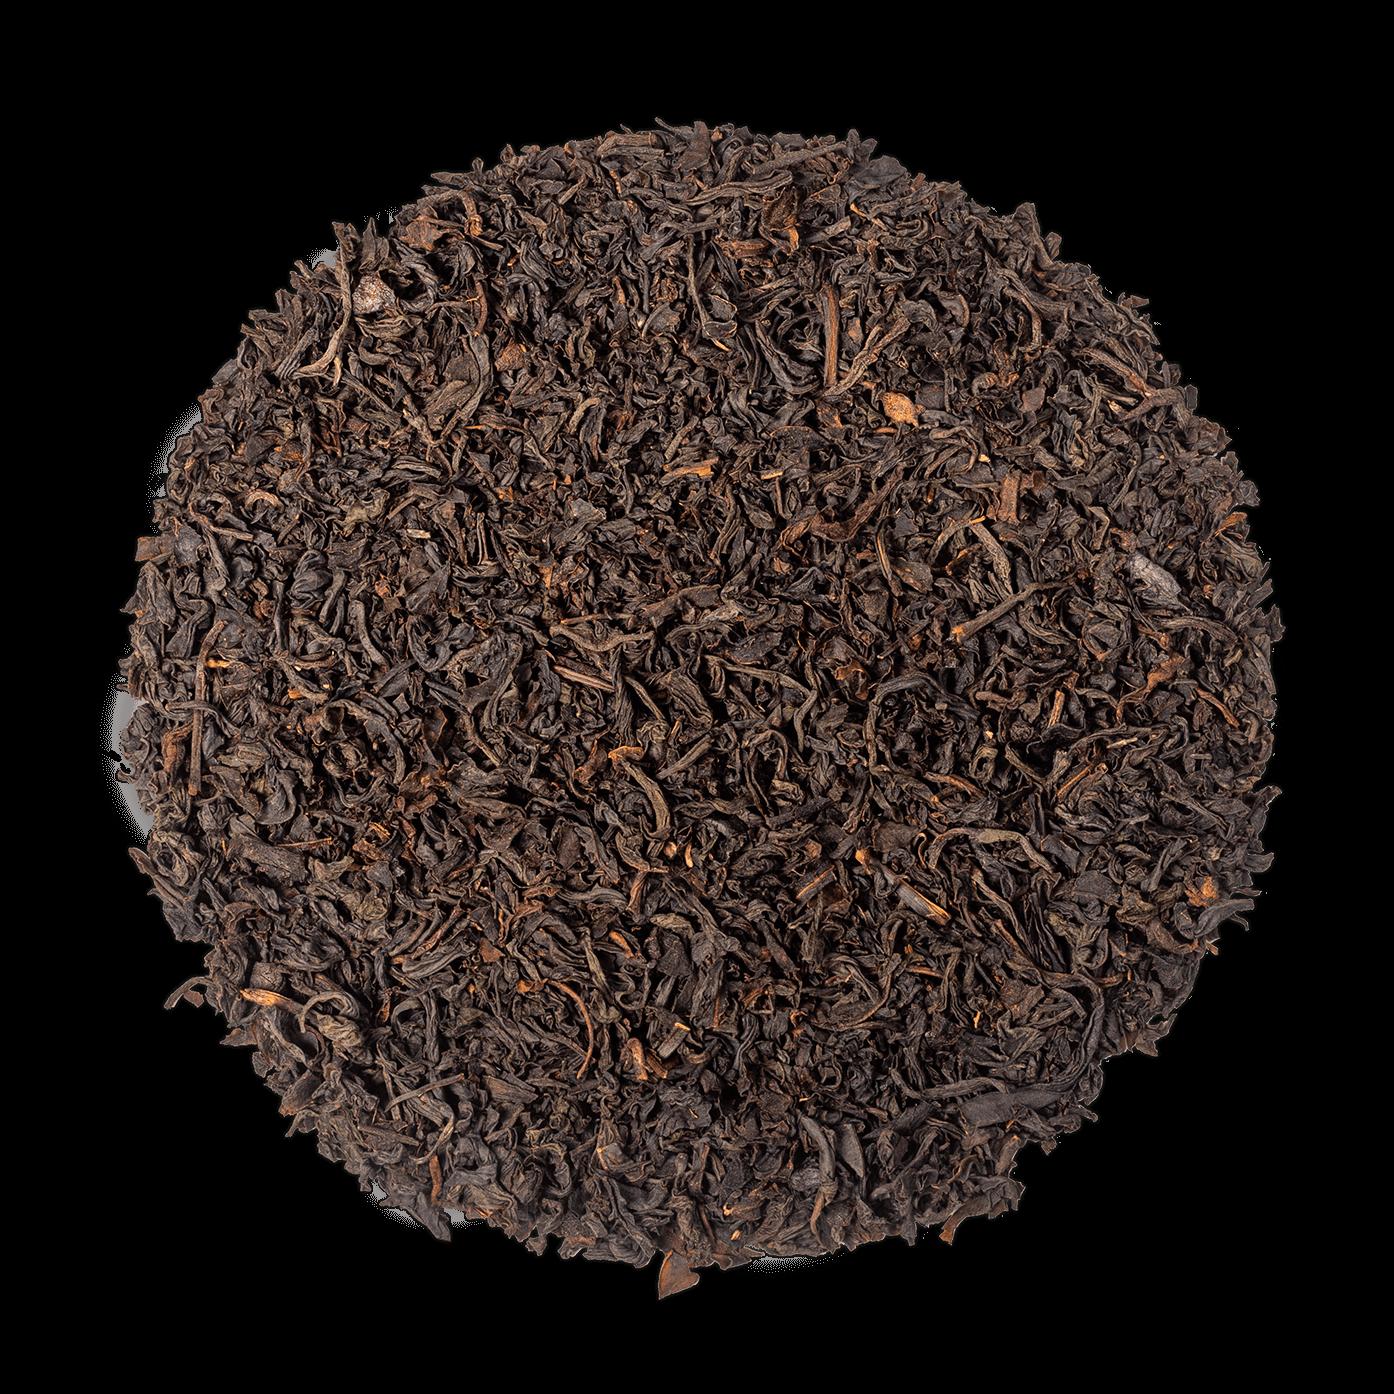 Bouquet de Fleurs N°108 bio - Thé earl grey, fleur Ylang-Ylang - Thé en vrac - Kusmi Tea